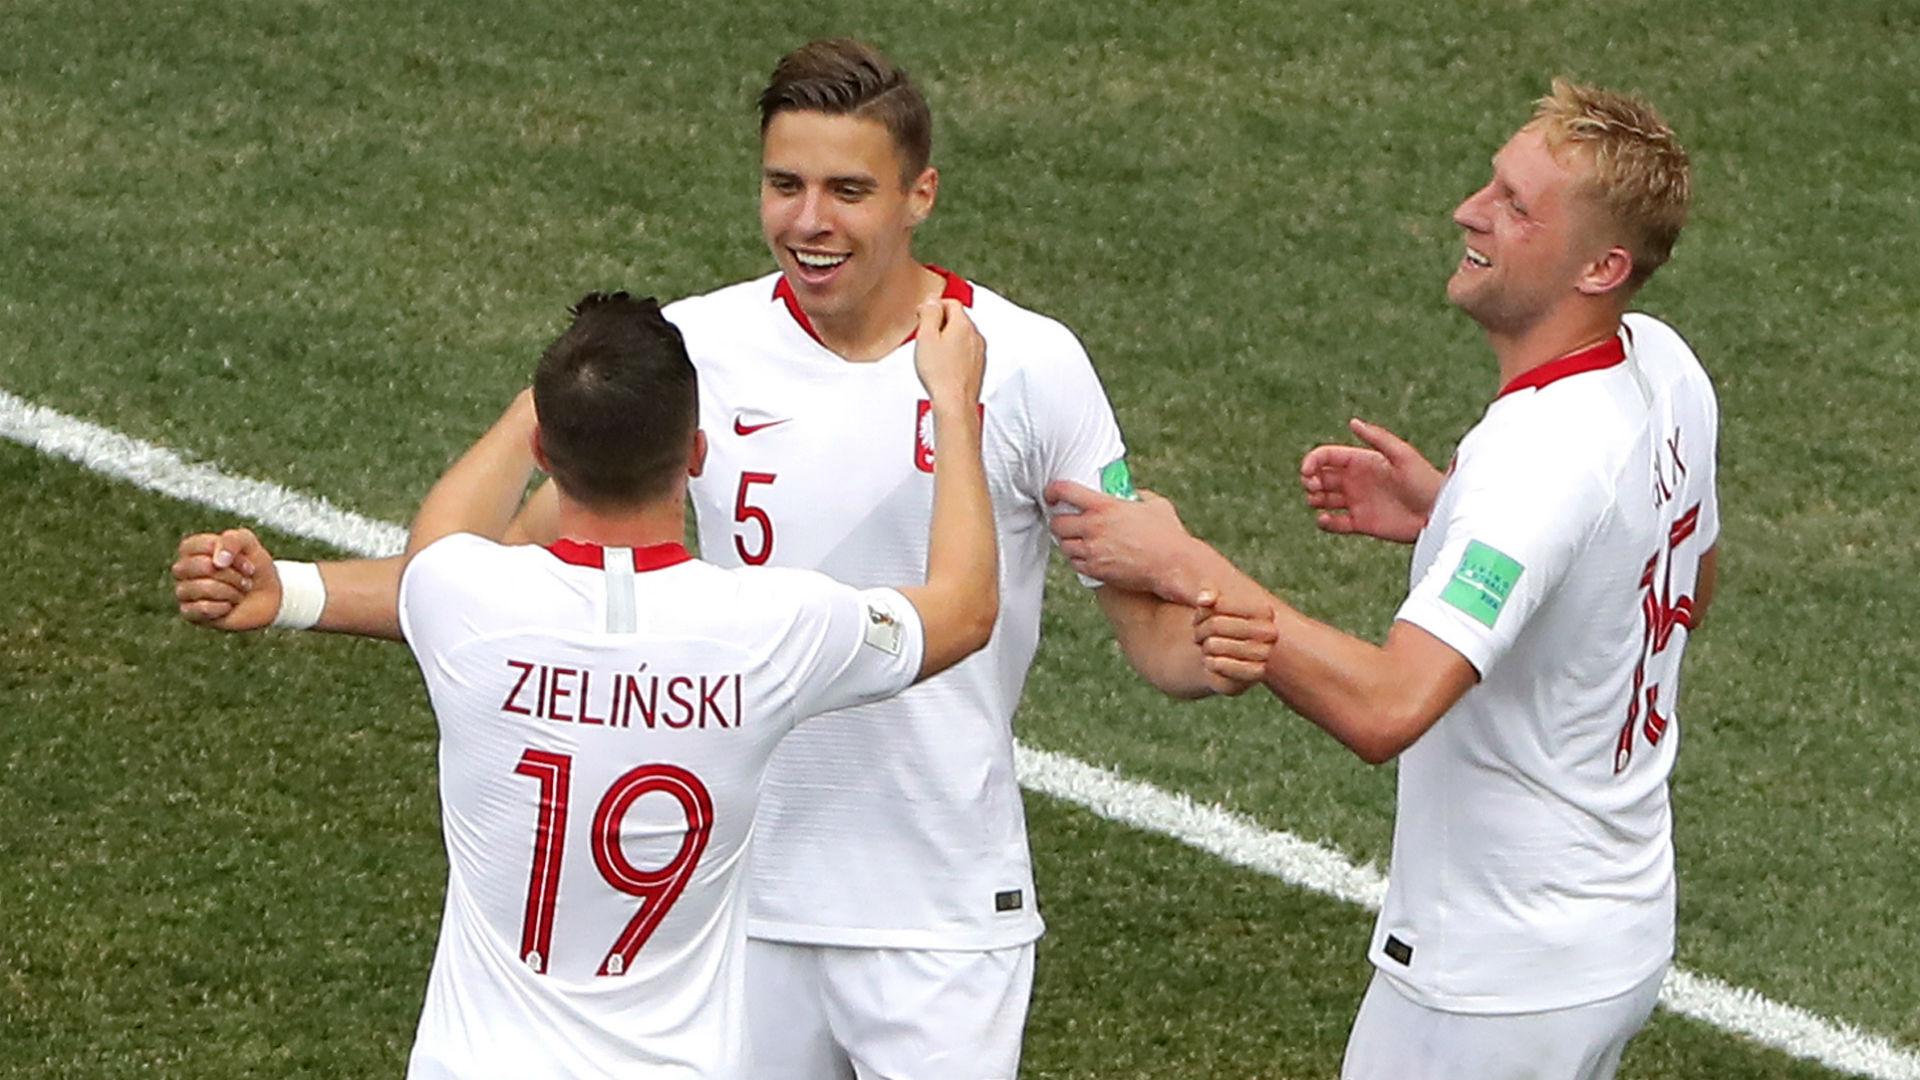 Poland celebrate vs Japan World Cup 2018